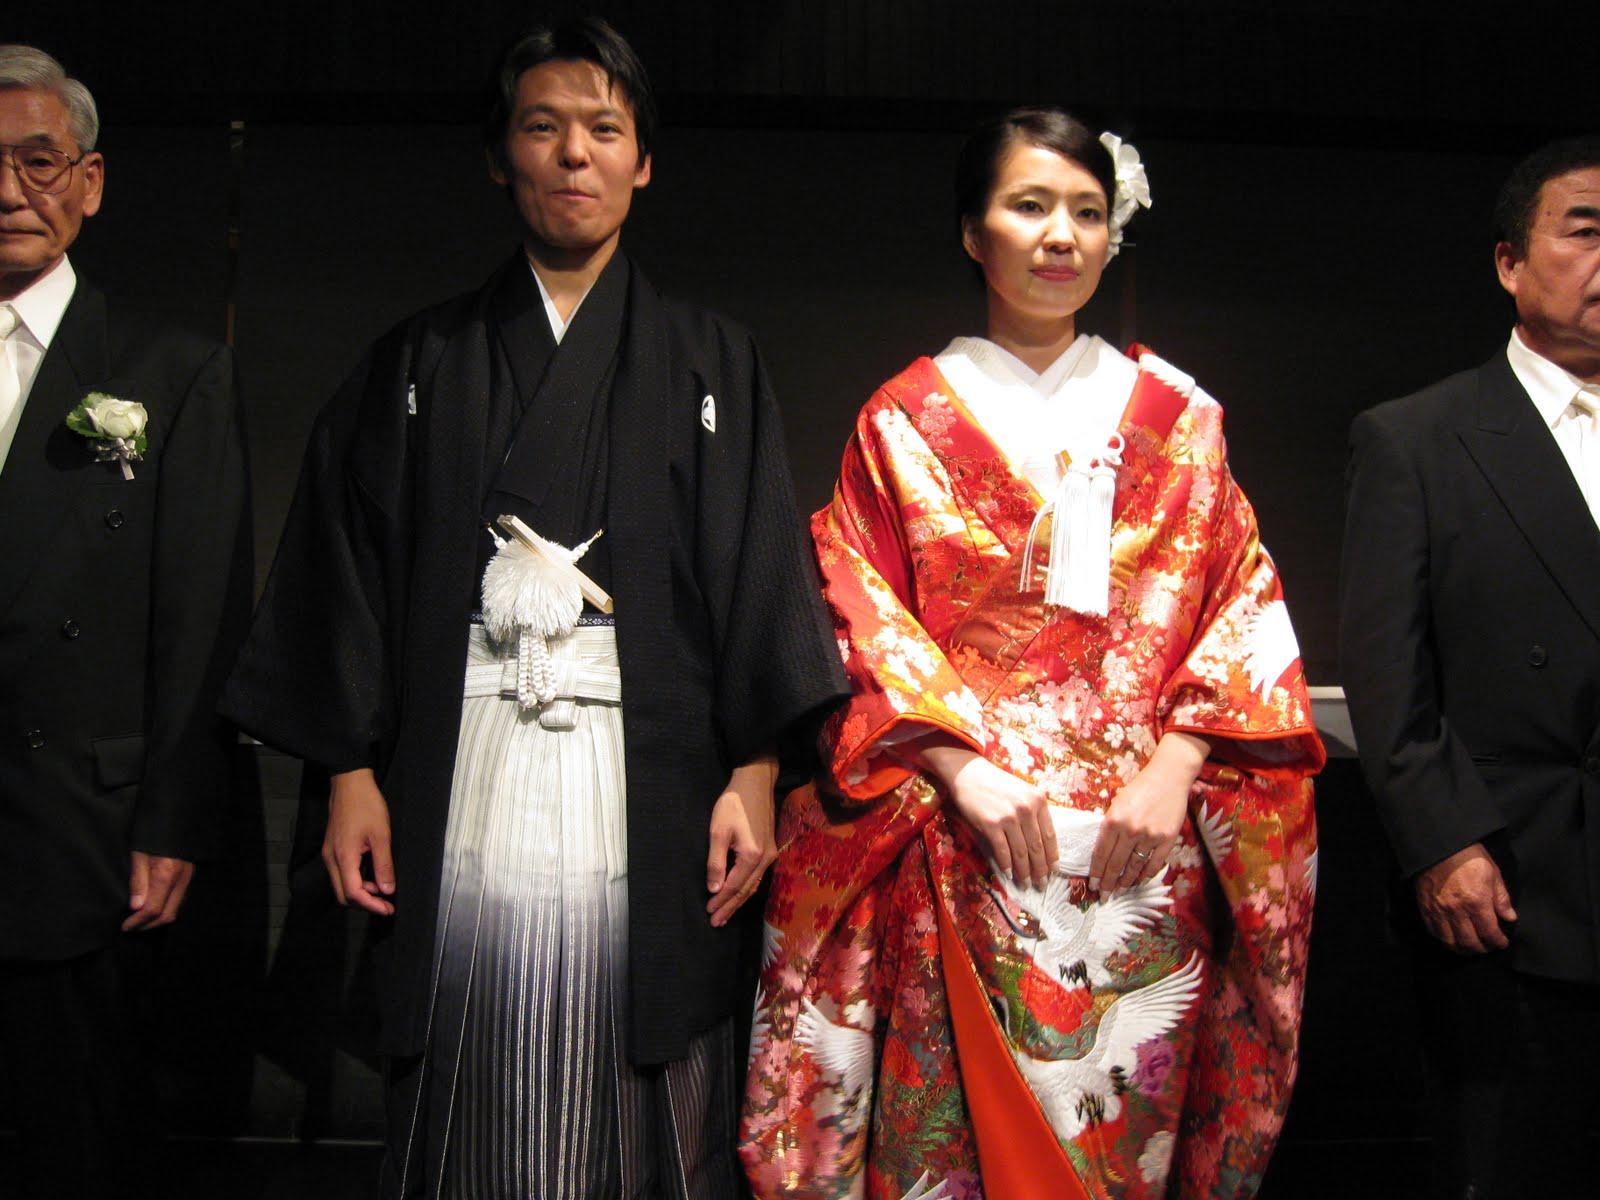 Japanese wedding blessings - Hakama And Wedding Kimono Super Heavy